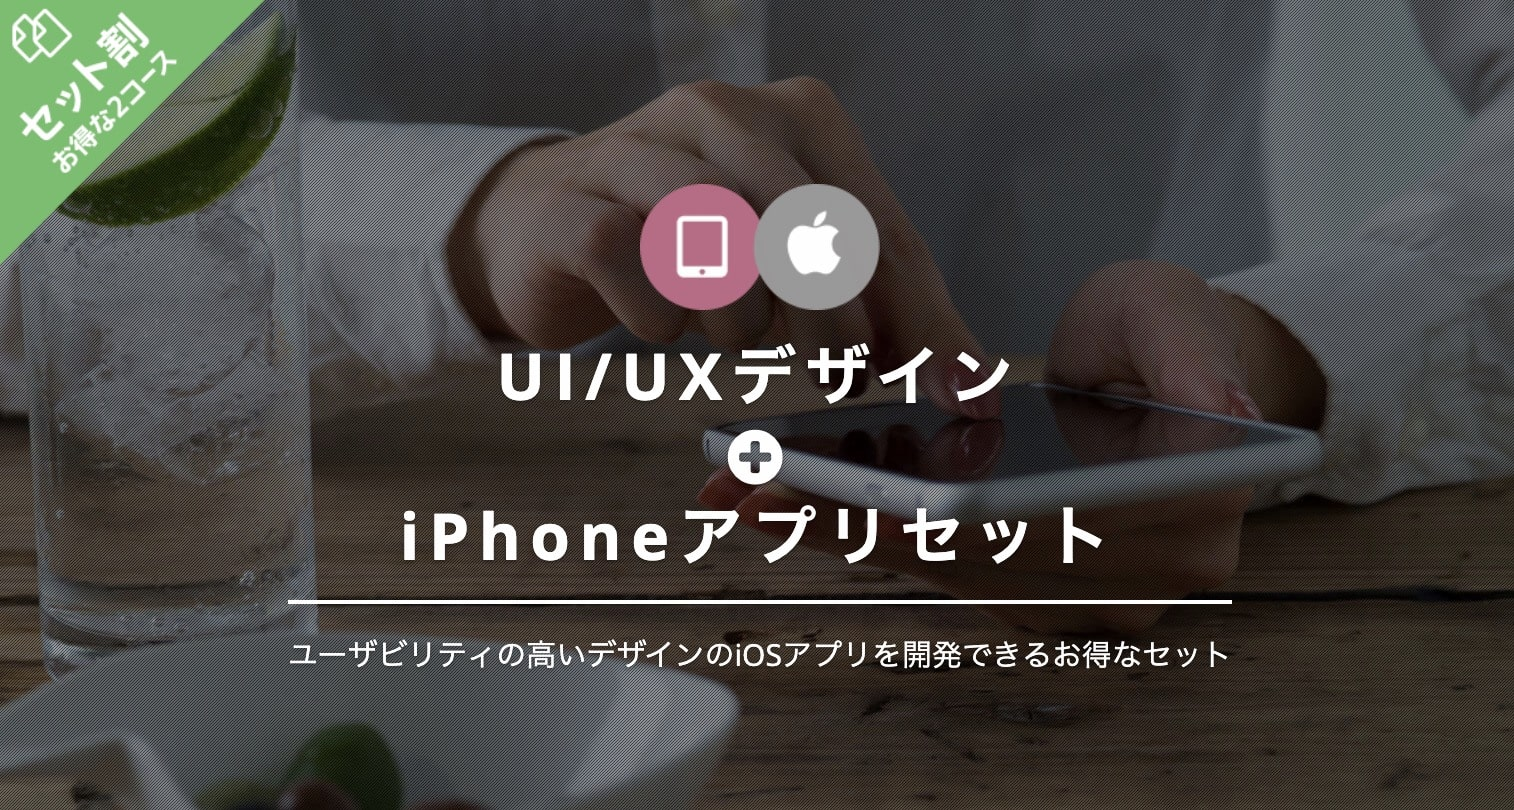 UI/UXデザイン+iPhoneアプリセットの料金|TechAcademy(テックアカデミー)2セット